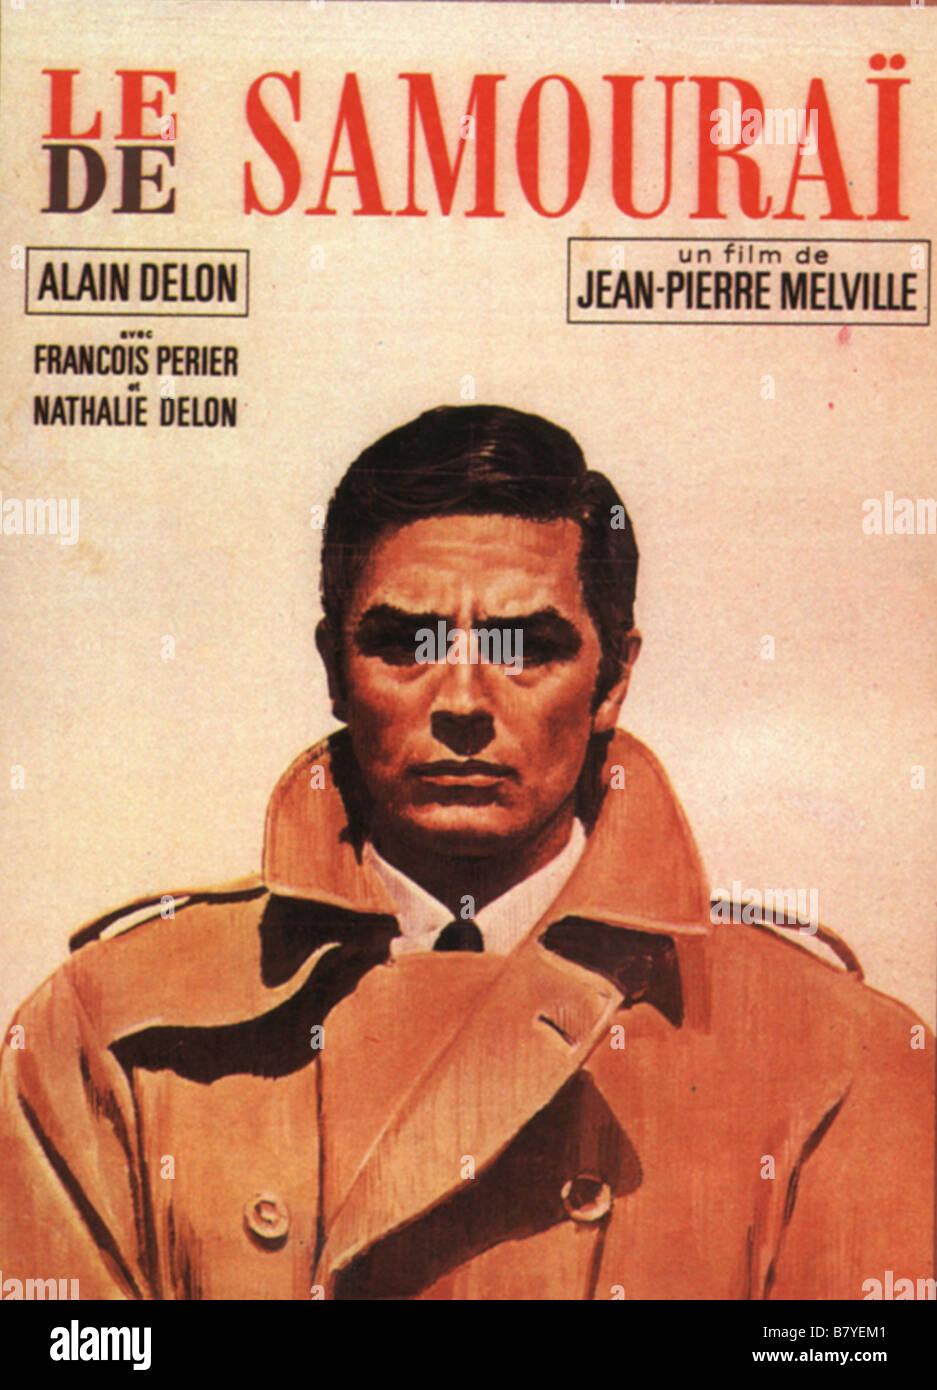 Le Samourai Year: 1967 - France Italy Alain Delon affiche, poster ...